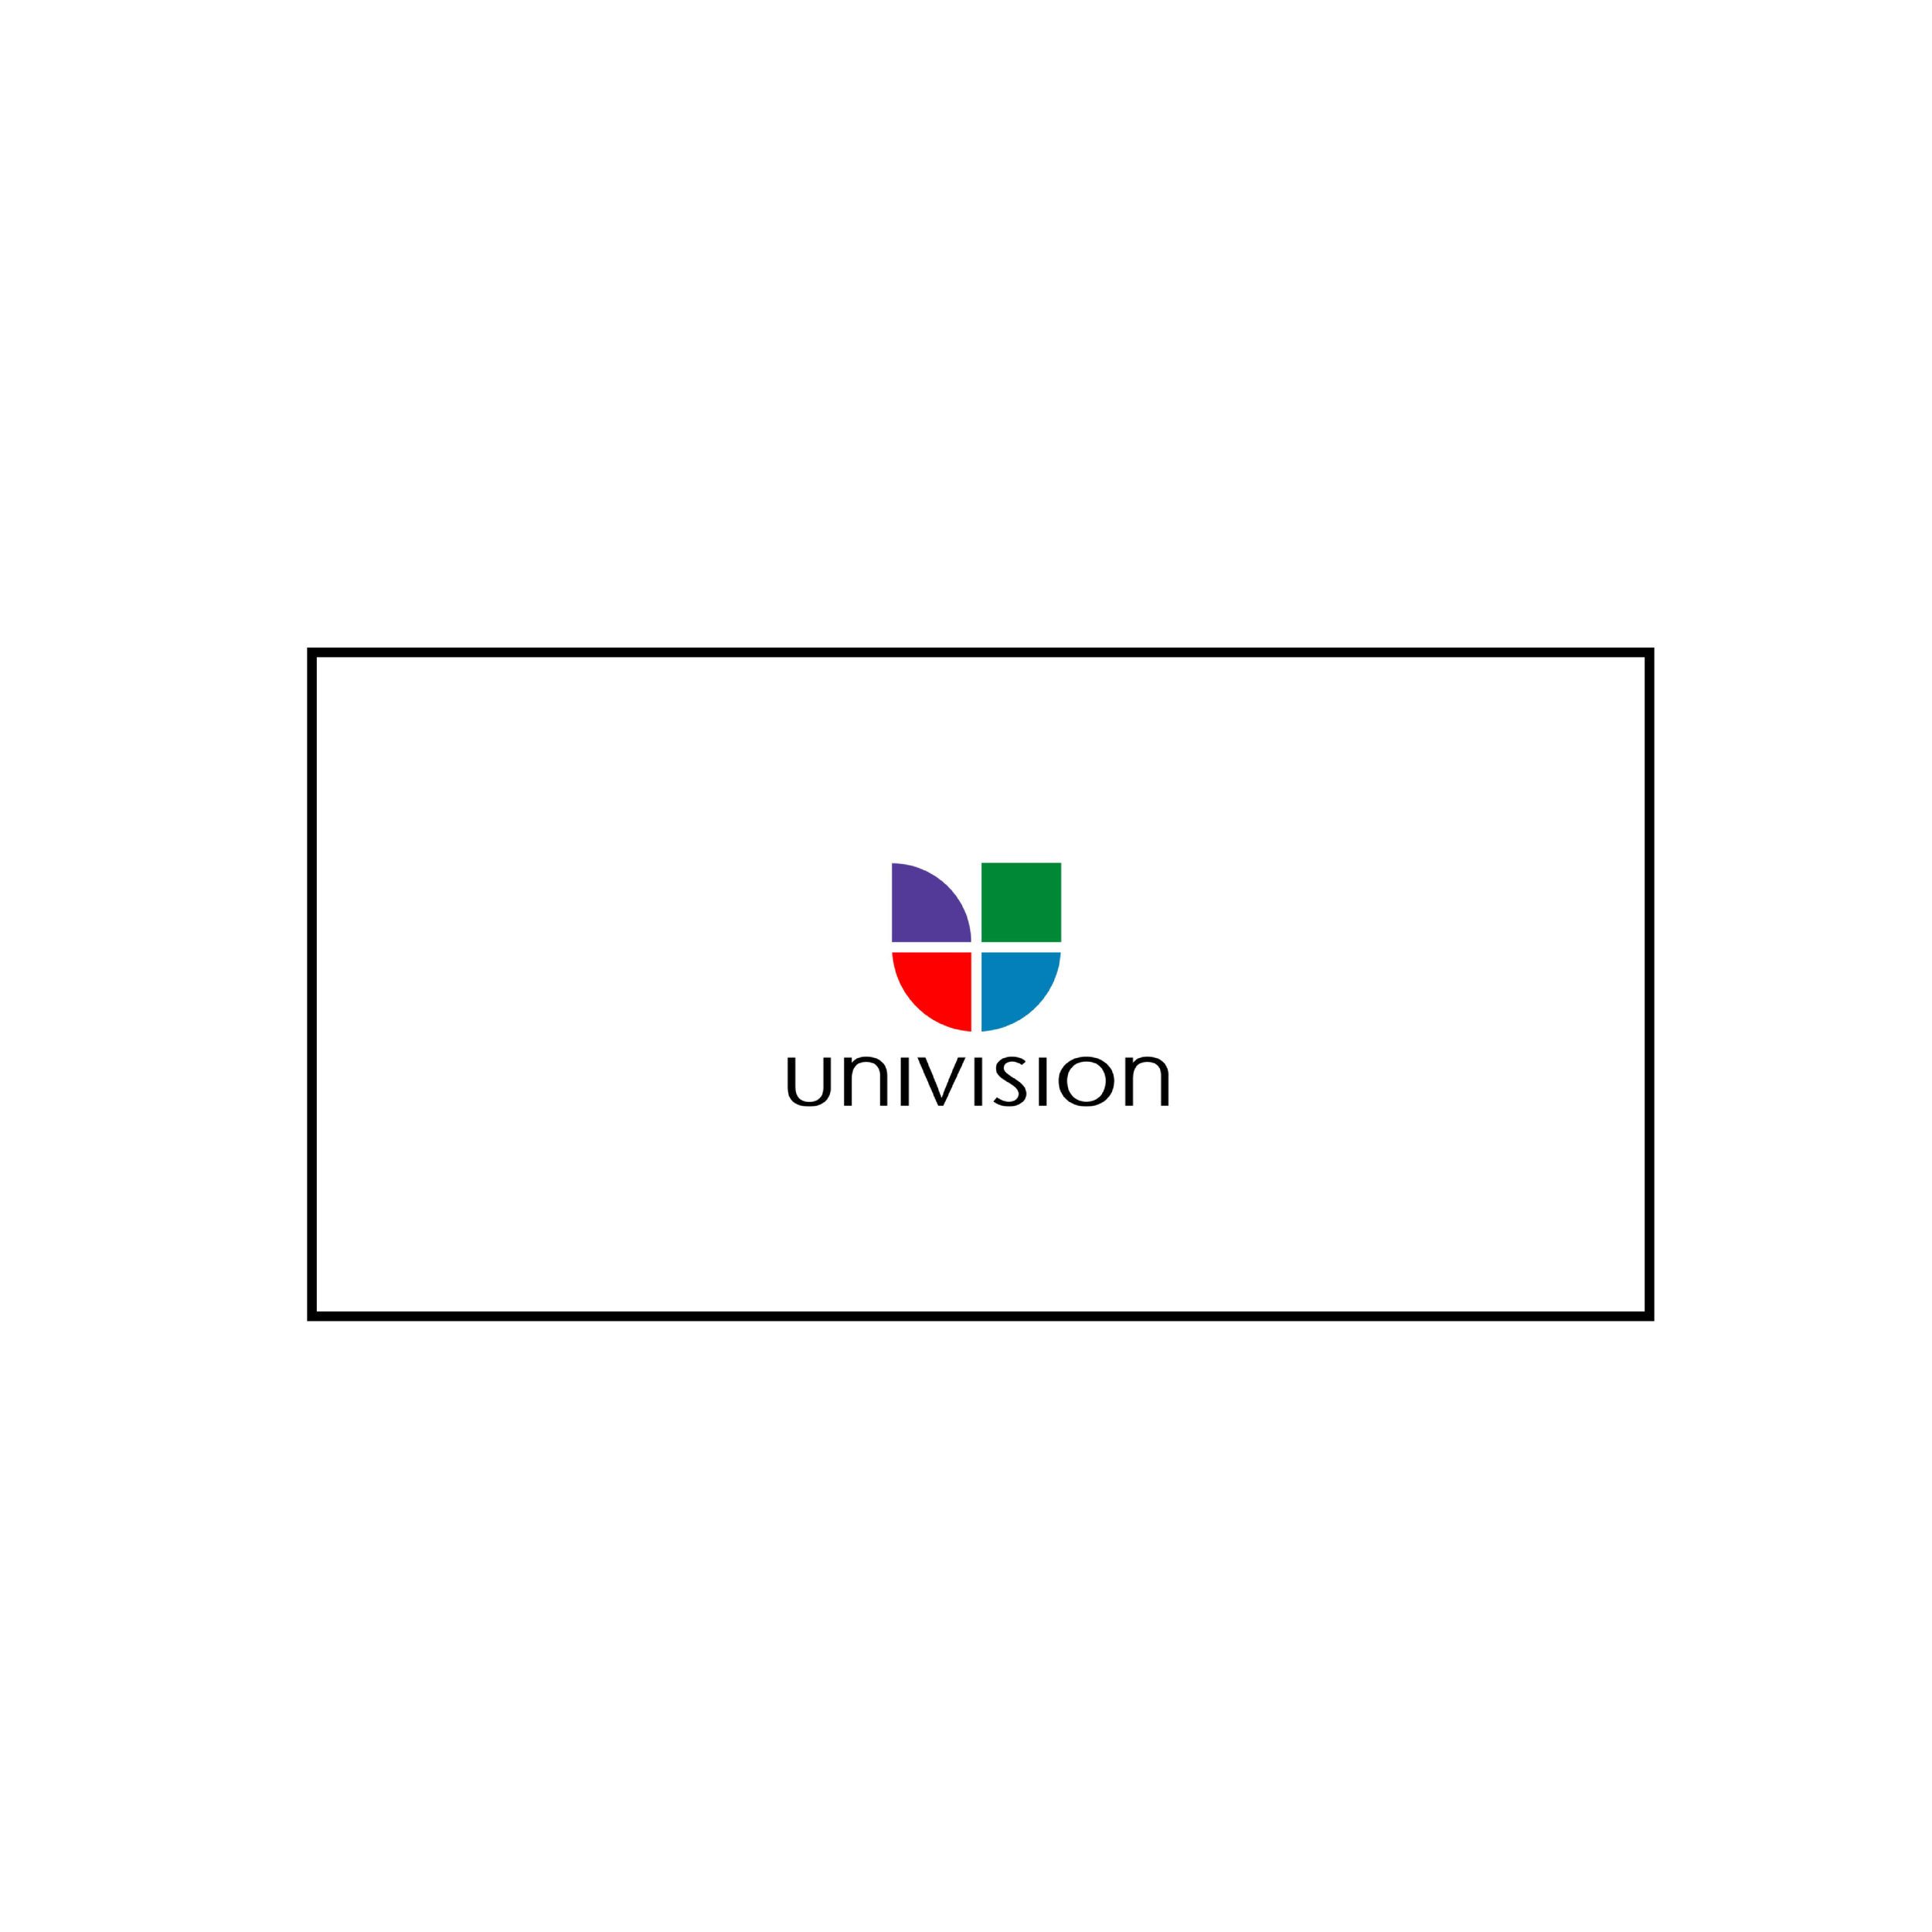 _UNIVISION.jpg